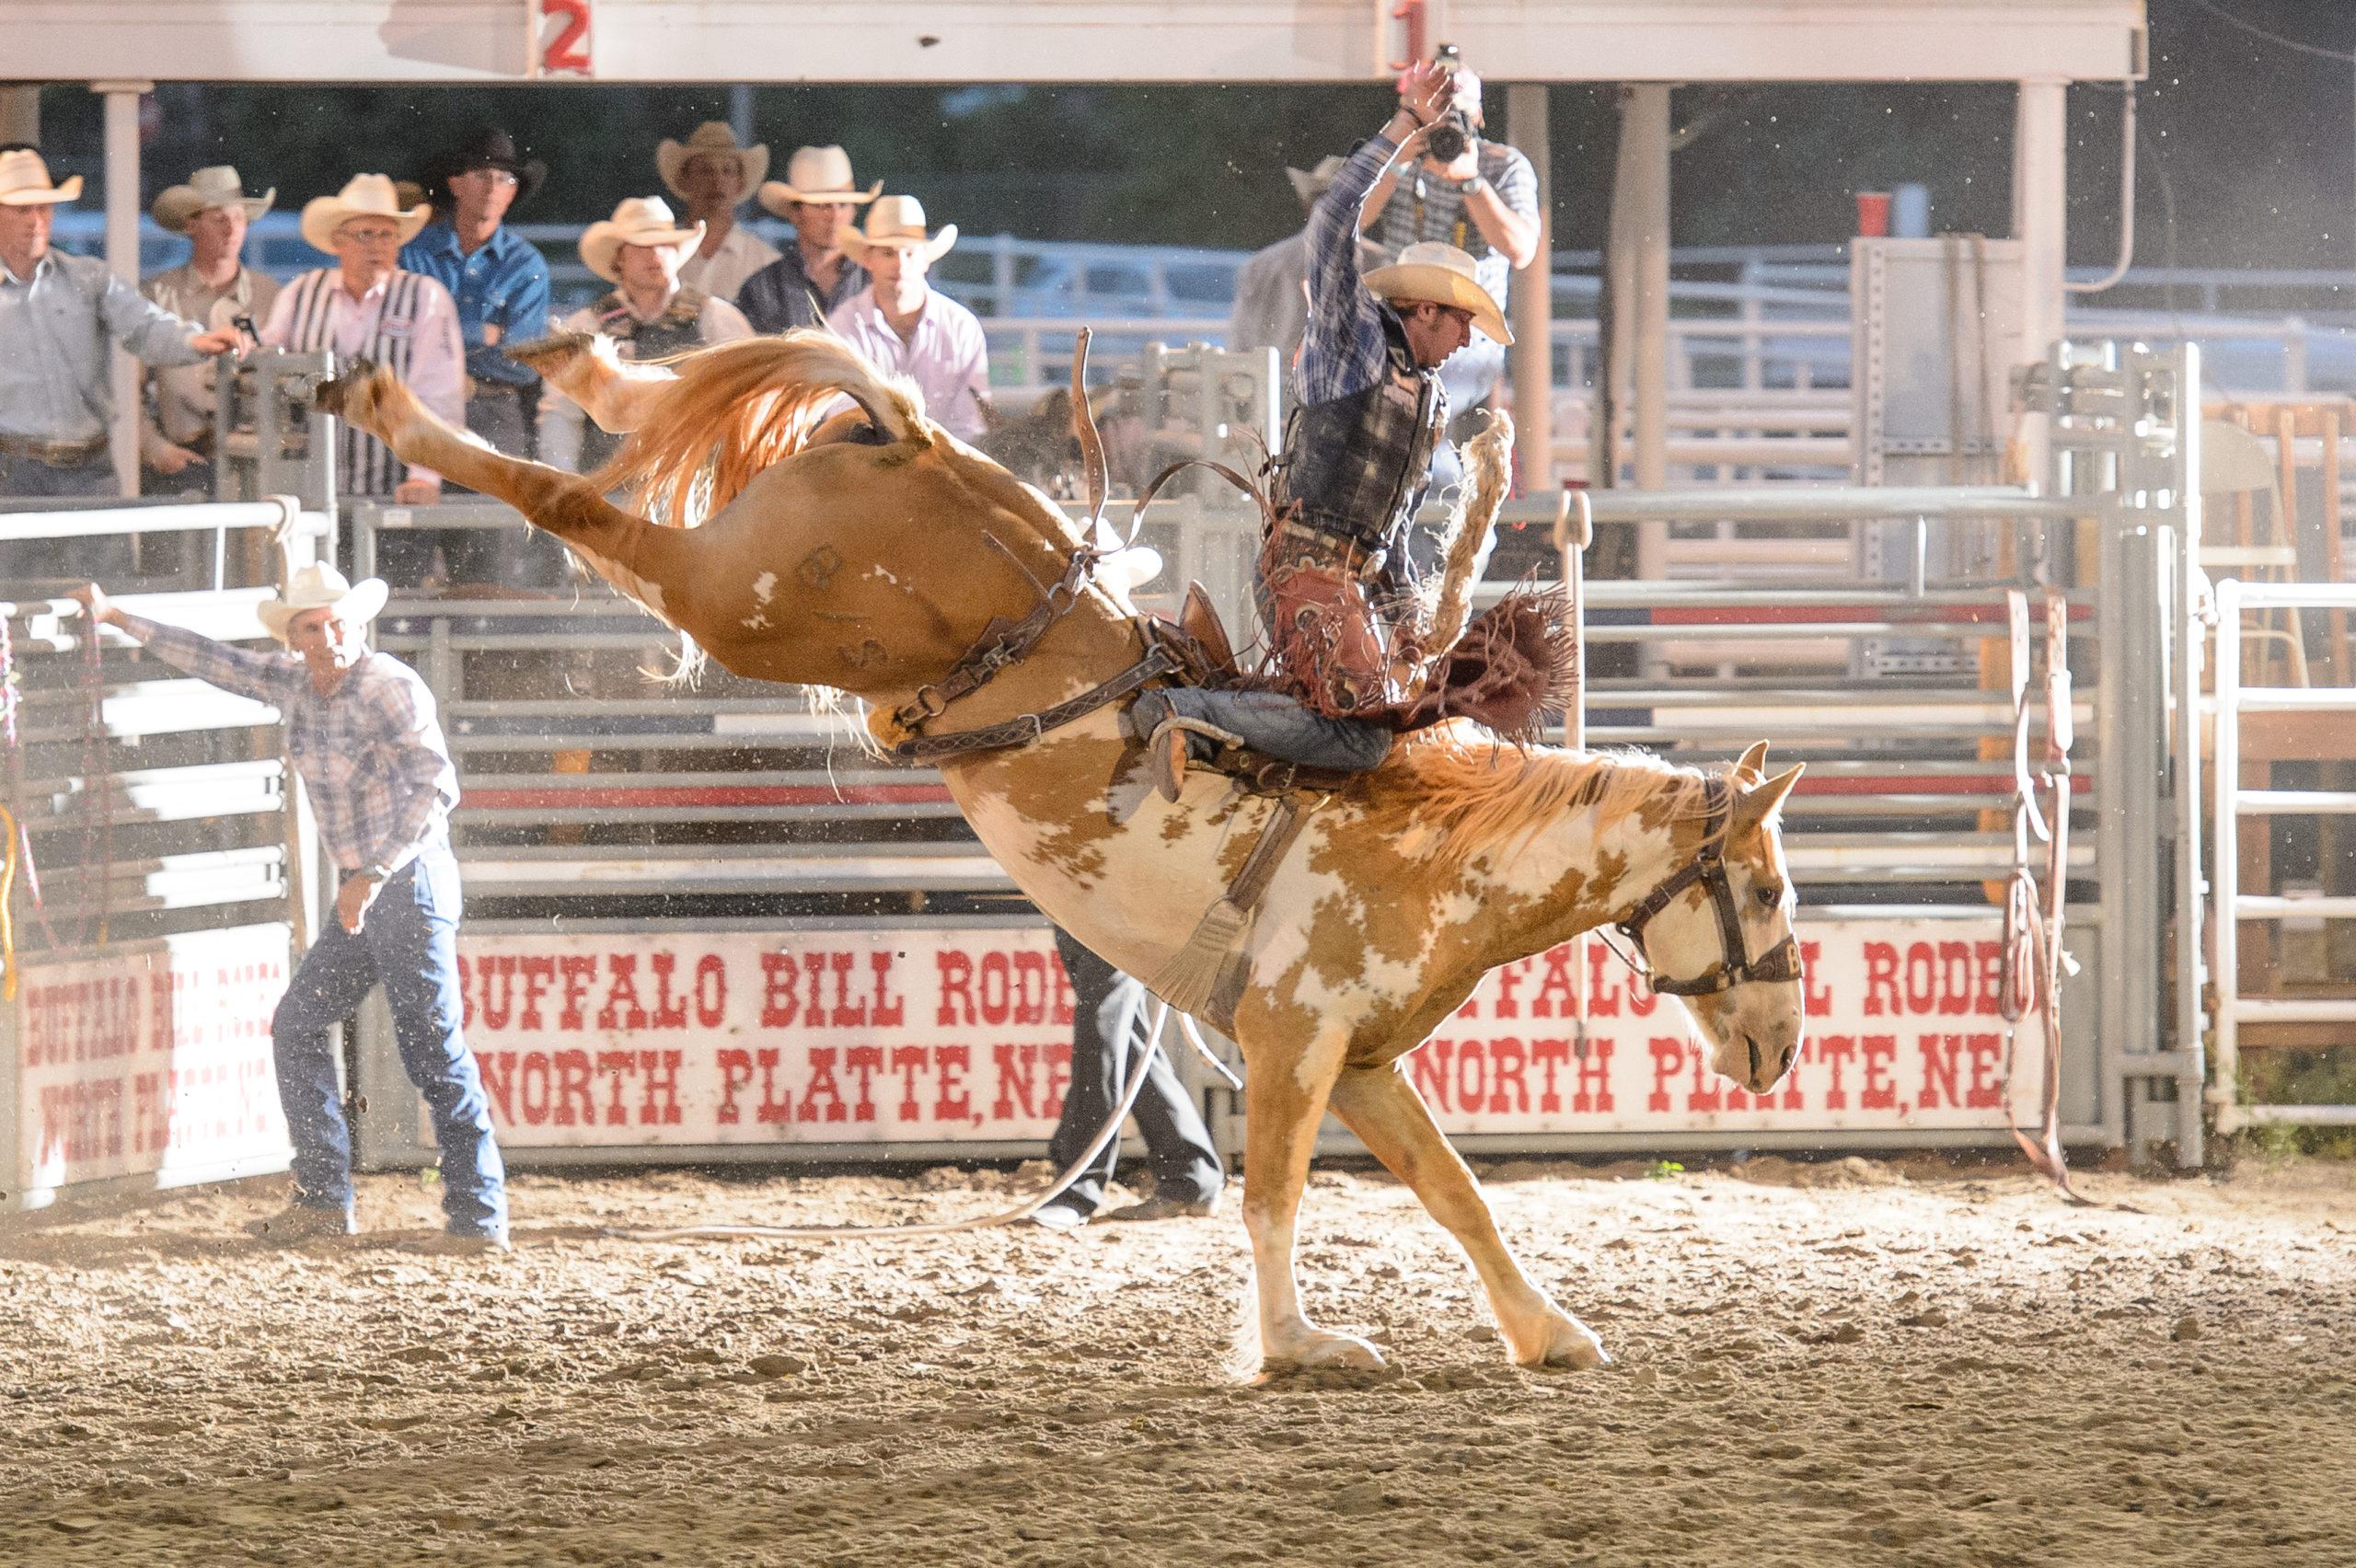 nebraskaland days, wild west arena, buffalo bill rodeo, prca, rodeo, pro rodeo, Visit North Platte, north platte, ne, nebraska